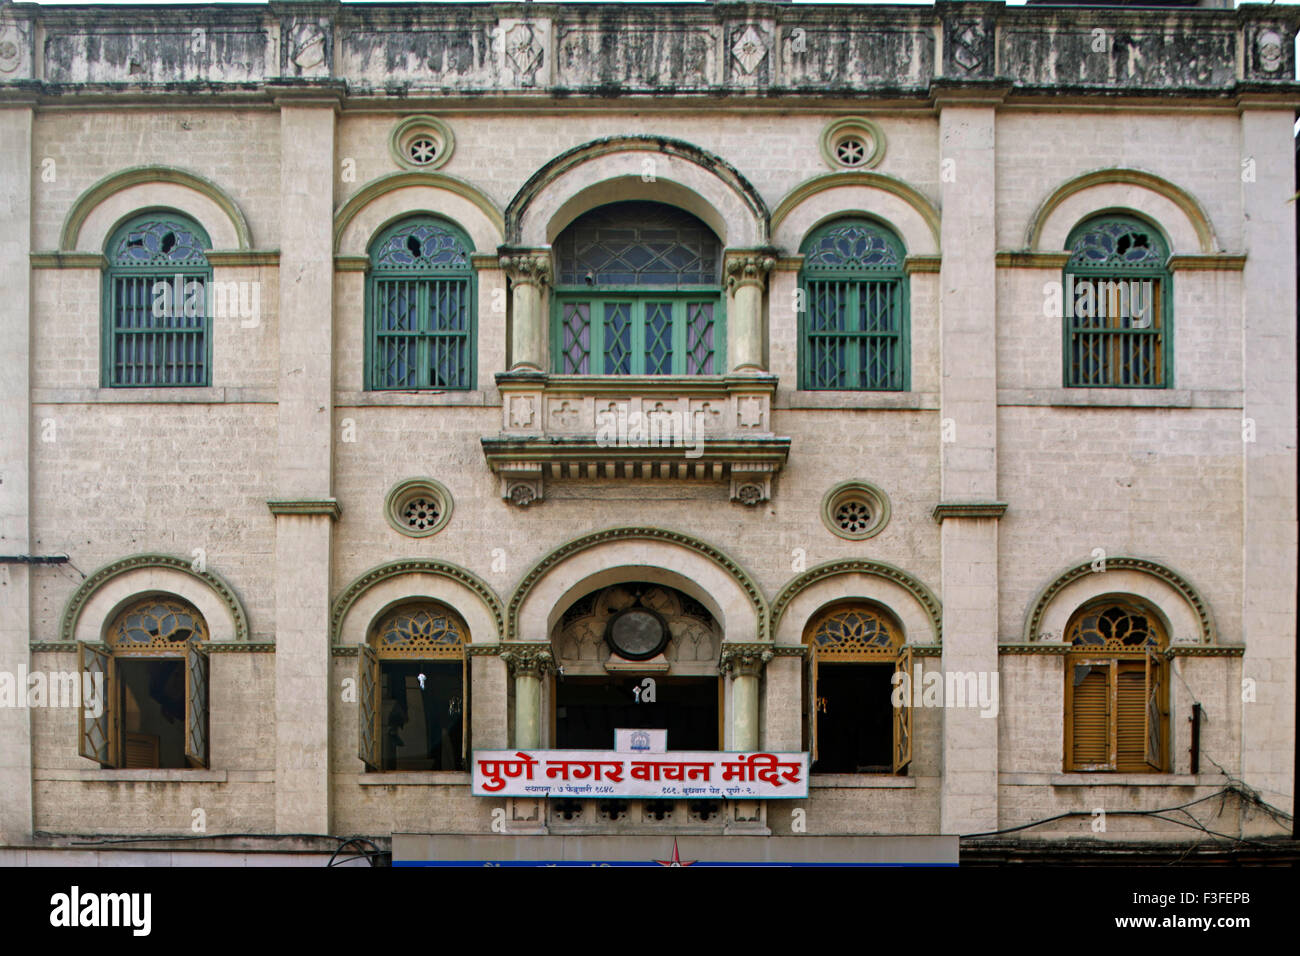 Pune Nagar Library Palika Vachnalay ; Pune ; Maharashtra ; India - Stock Image